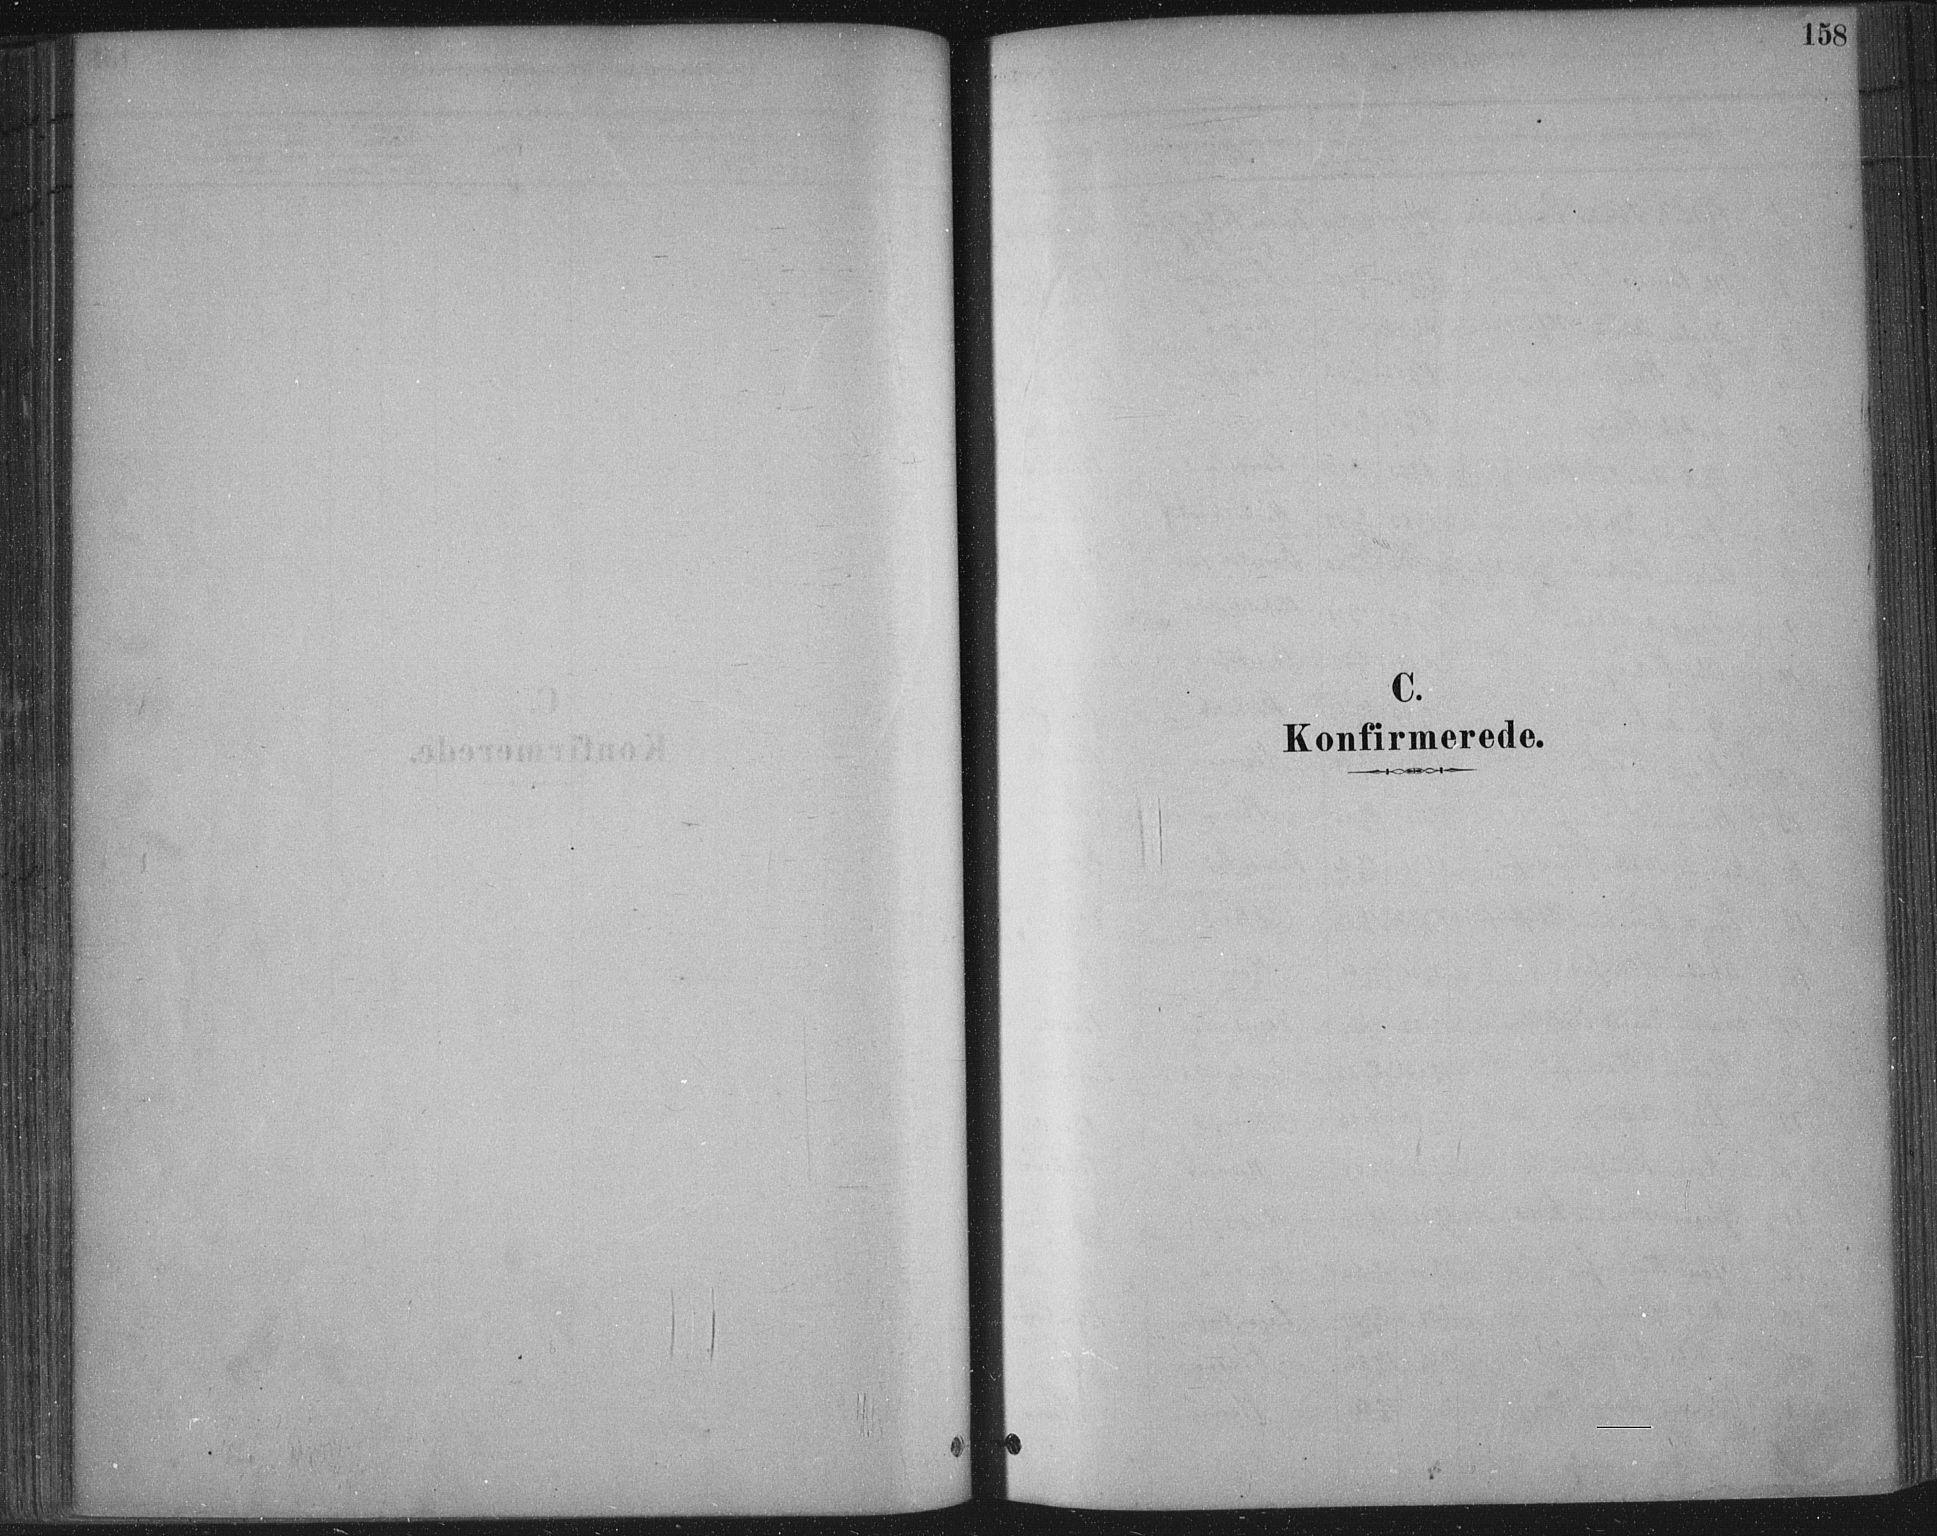 SAKO, Bamble kirkebøker, F/Fa/L0007: Ministerialbok nr. I 7, 1878-1888, s. 158